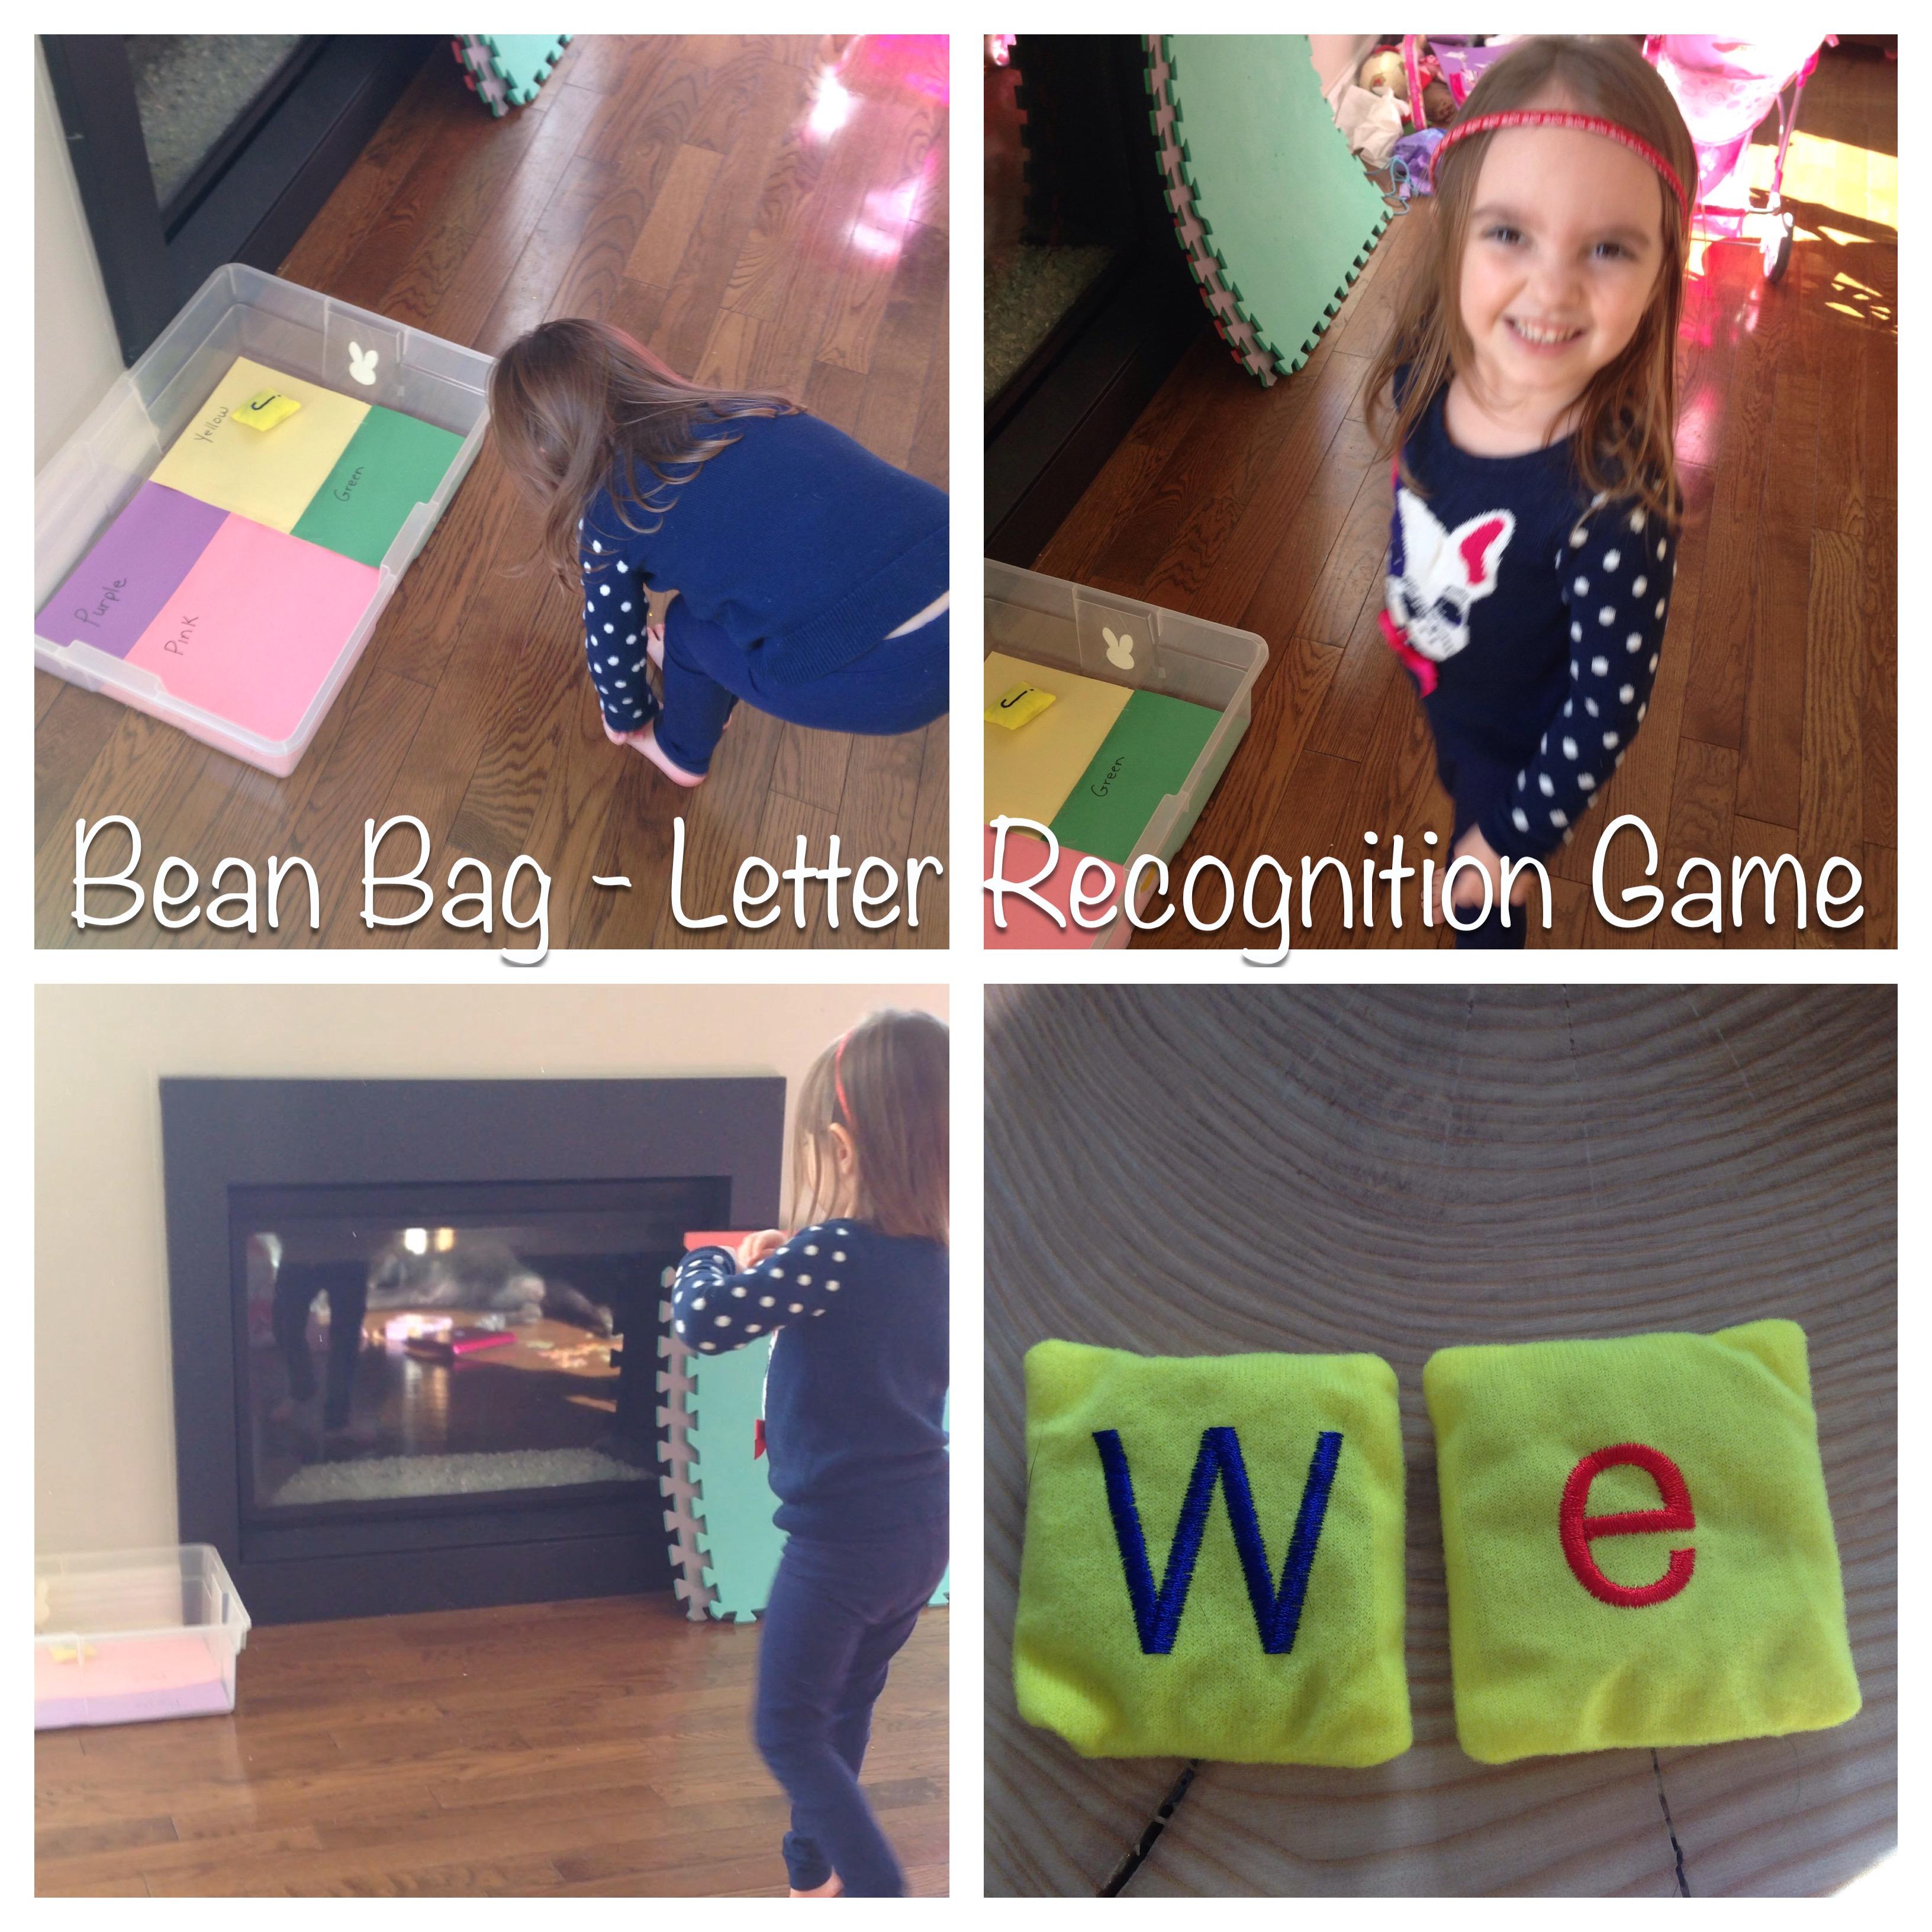 Bean Bag Toss Letter Recognition Game